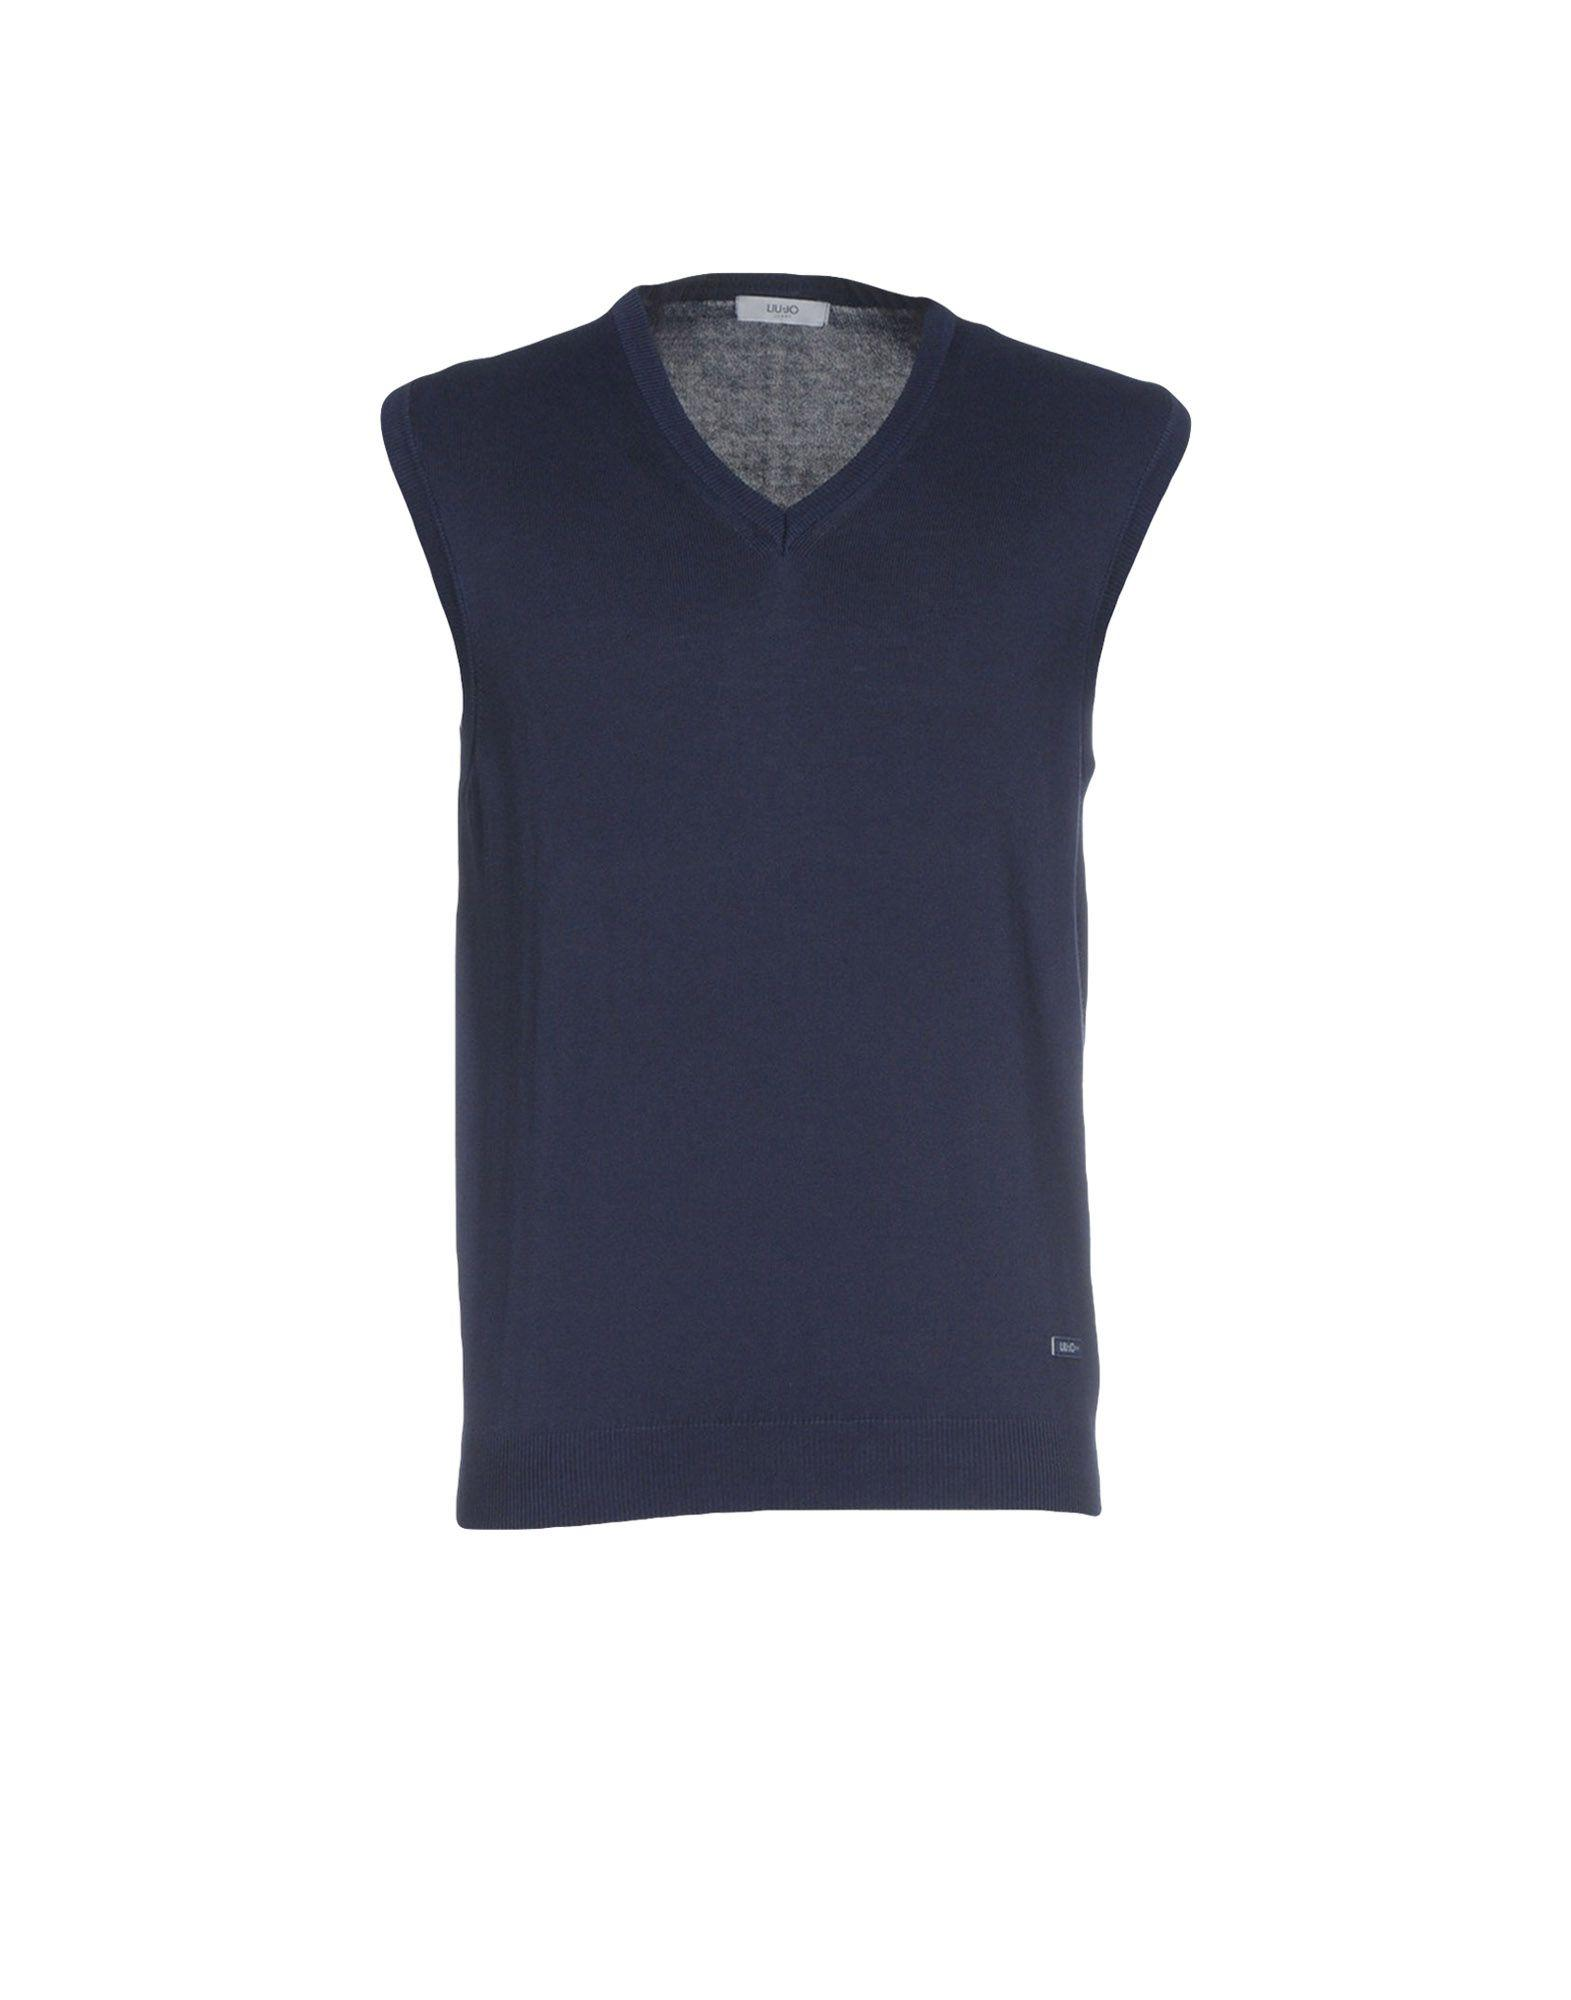 Liu •jo Sleeveless Sweater In Dark Blue